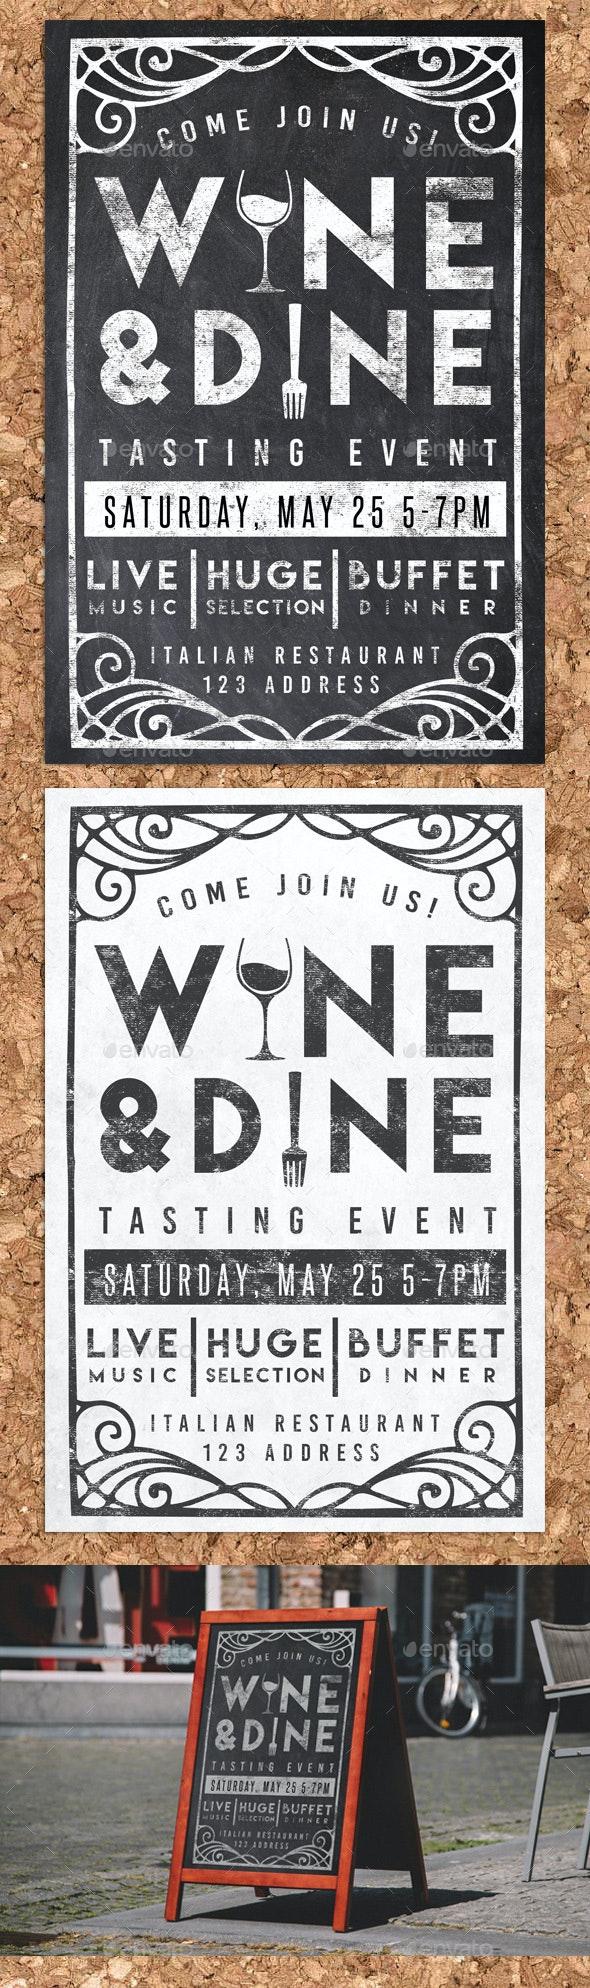 Wine & Dine Event Chalk Flyer Invite - Restaurant Flyers